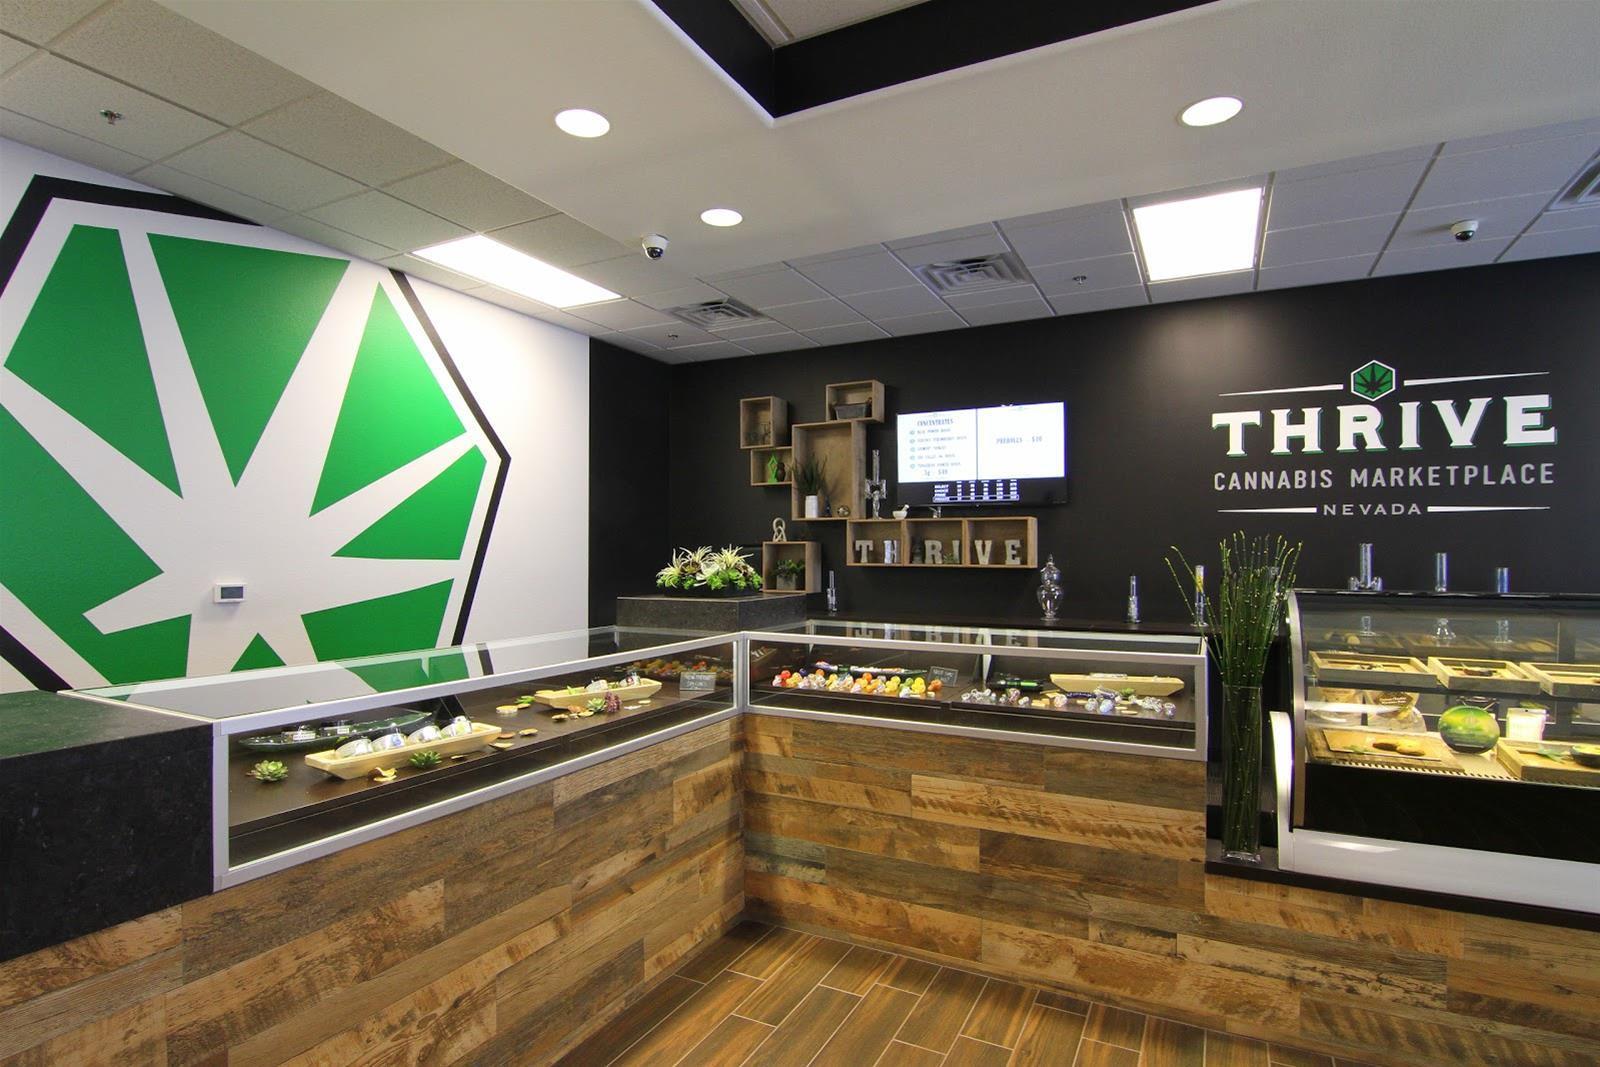 Thrive-Cannabis-Marketplace-North-Las-Vegas-2